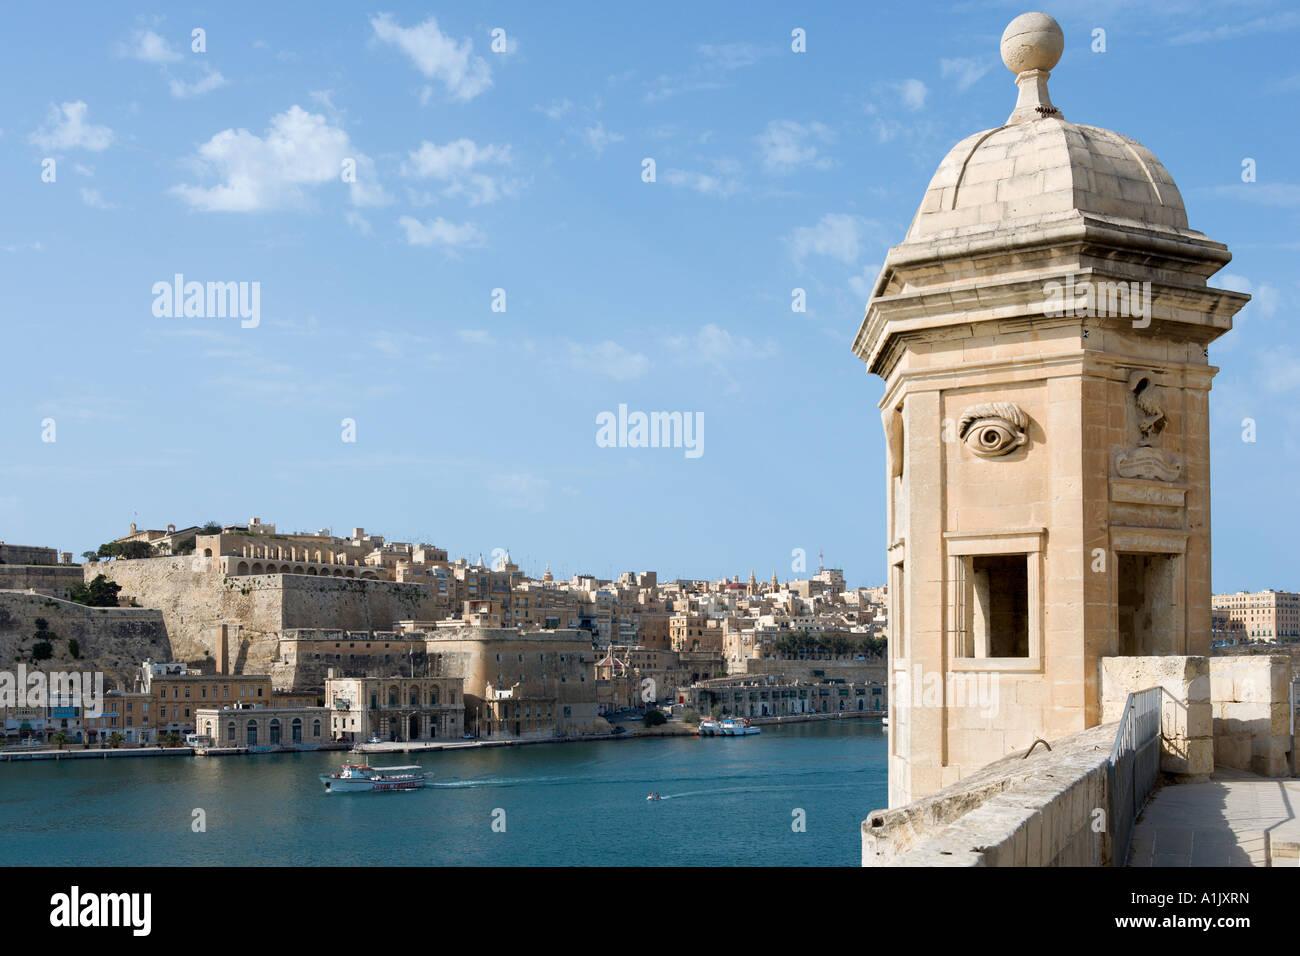 View of Valletta and Grand Harbour from Senglea, Valletta, Malta - Stock Image